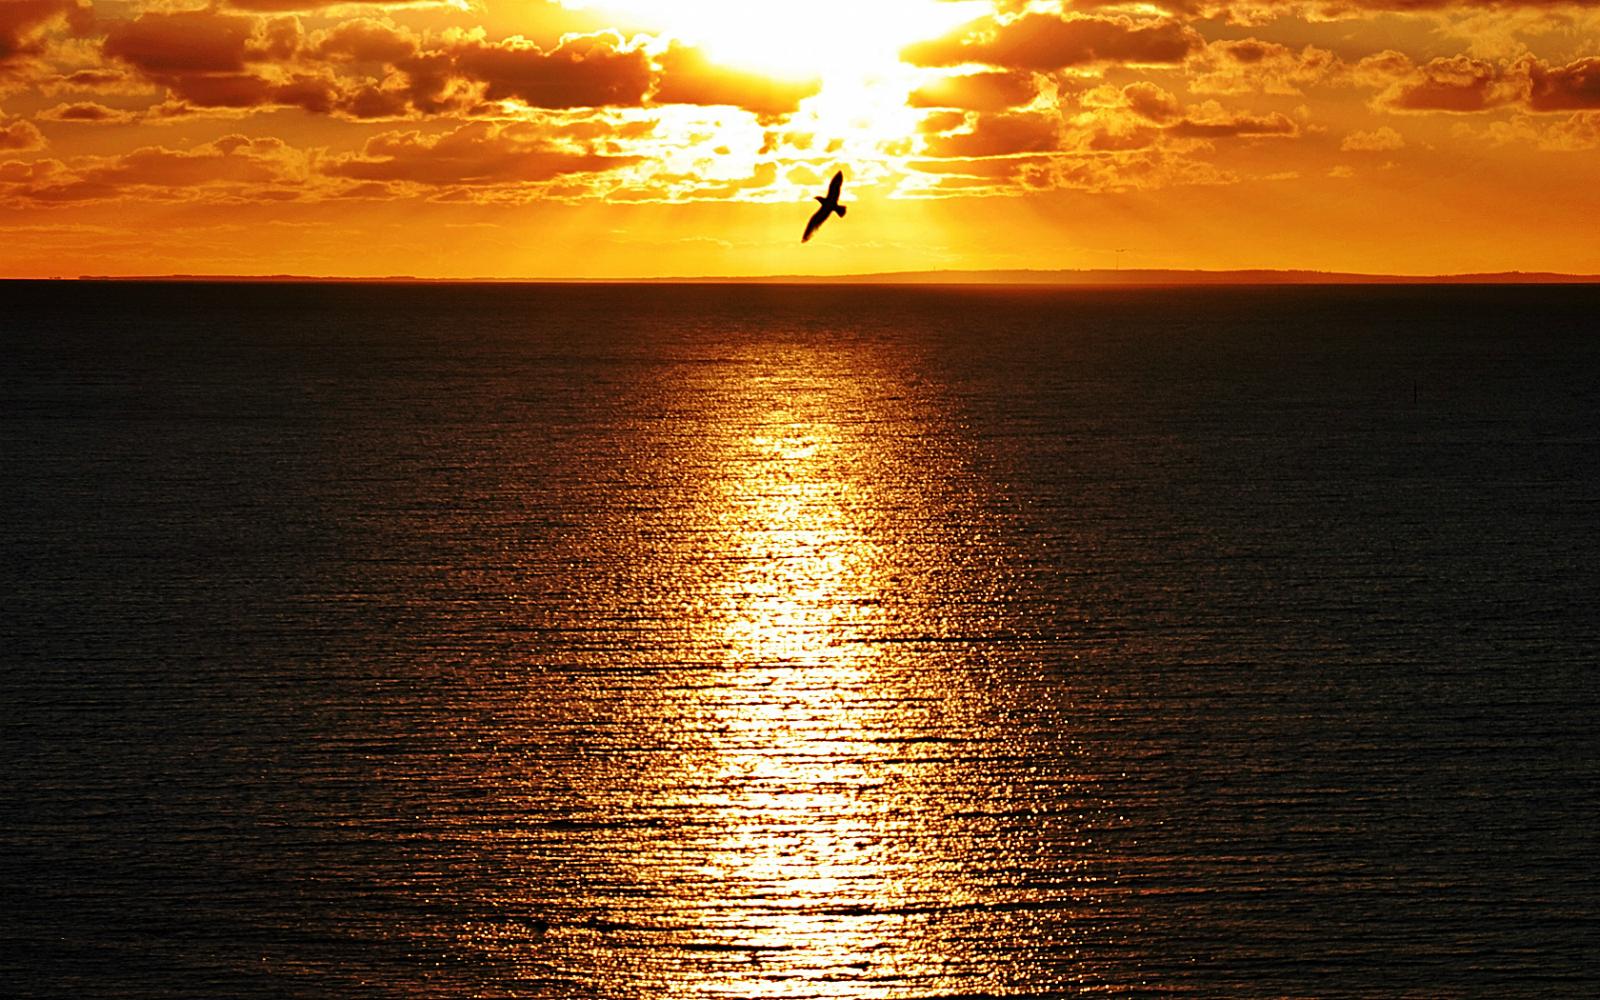 sunset awesome oregon wallpaper - photo #41